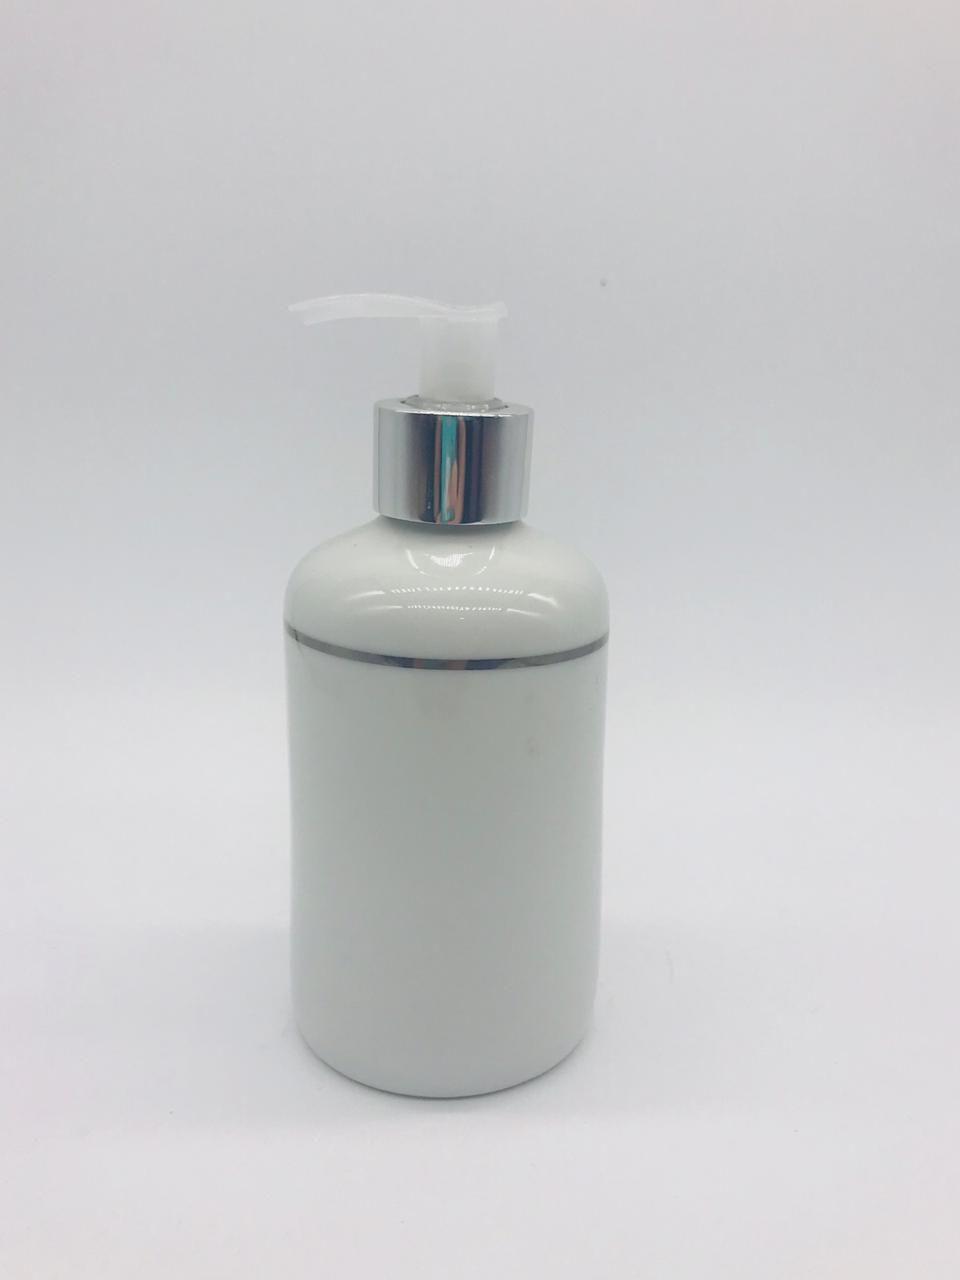 Porta Álcool Gel Porcelana Branco Com Filete Prateado -  1 UND